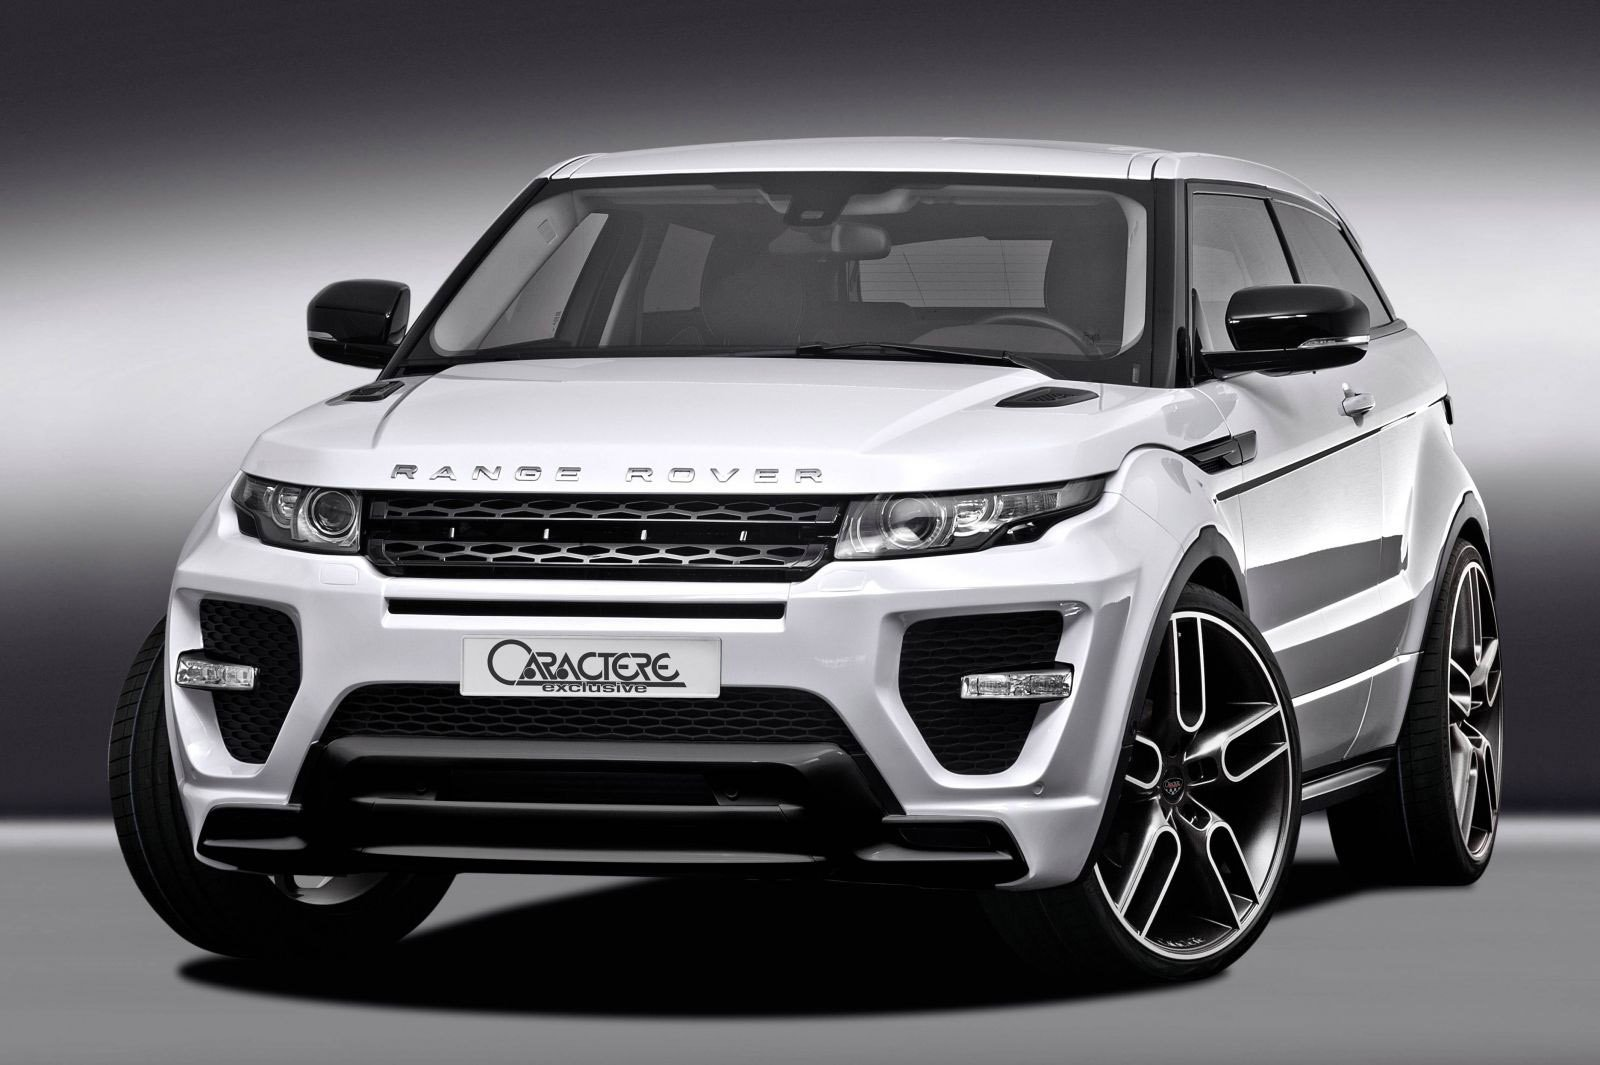 2014 caractere exclusive range rover evoque bodykit dark cars wallpapers. Black Bedroom Furniture Sets. Home Design Ideas